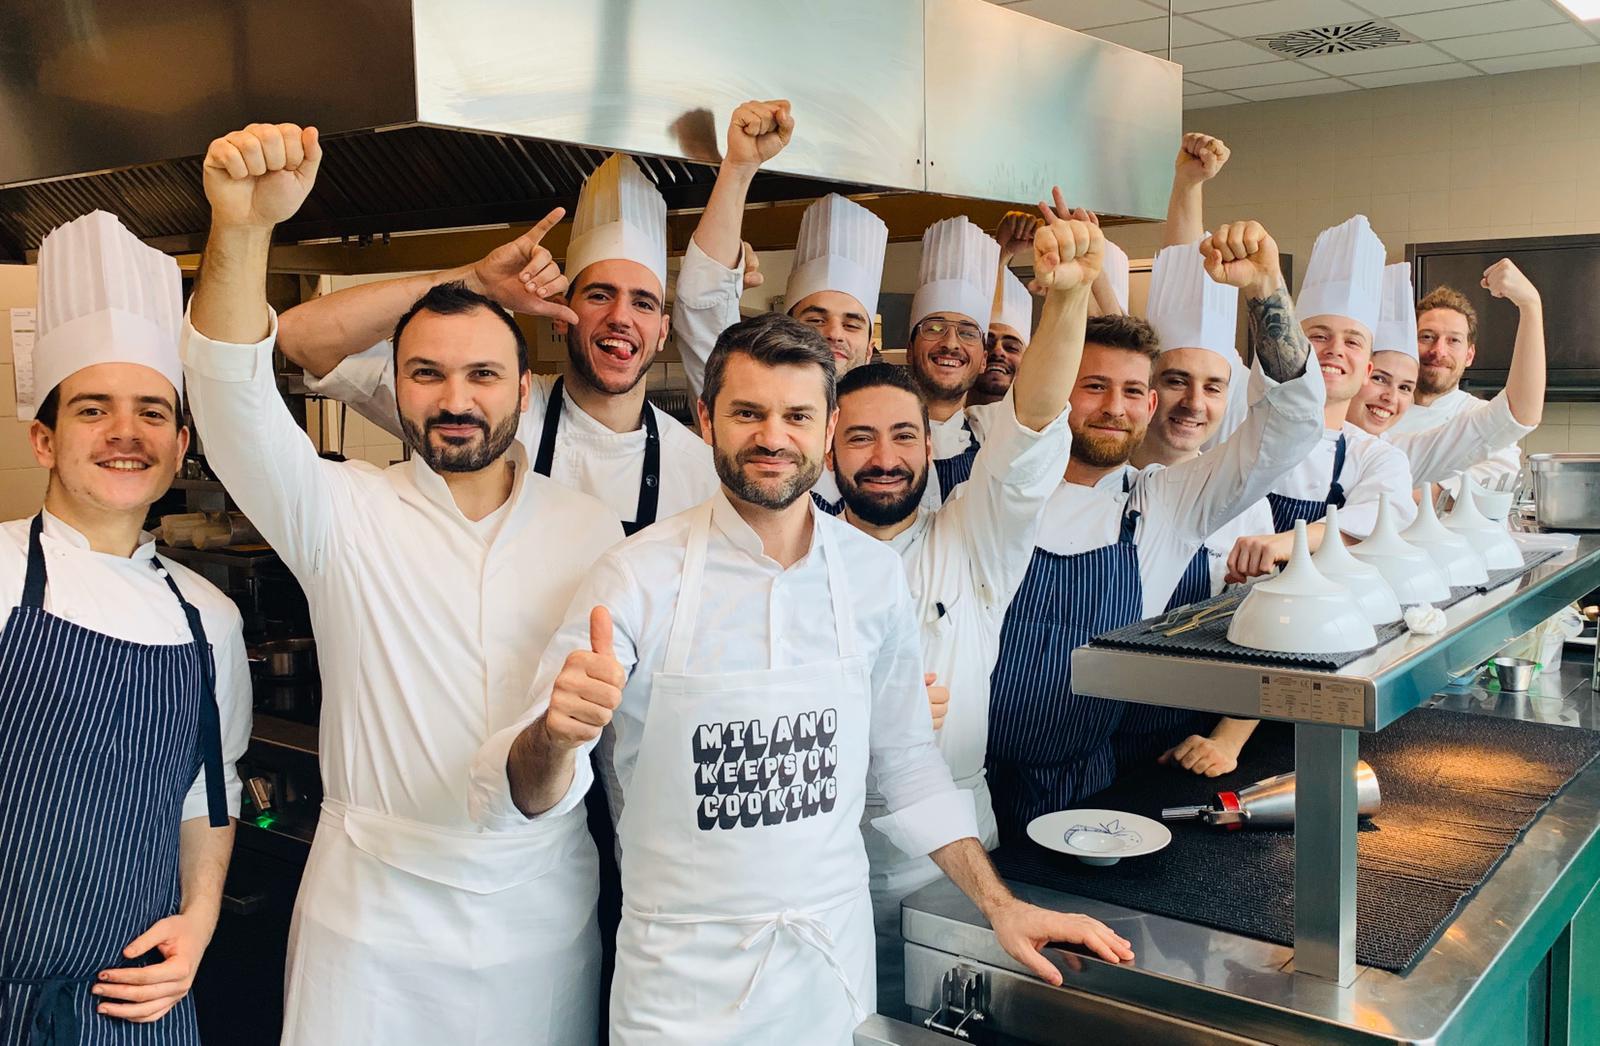 Coronavirus campagna Milano Keeps On Cooking